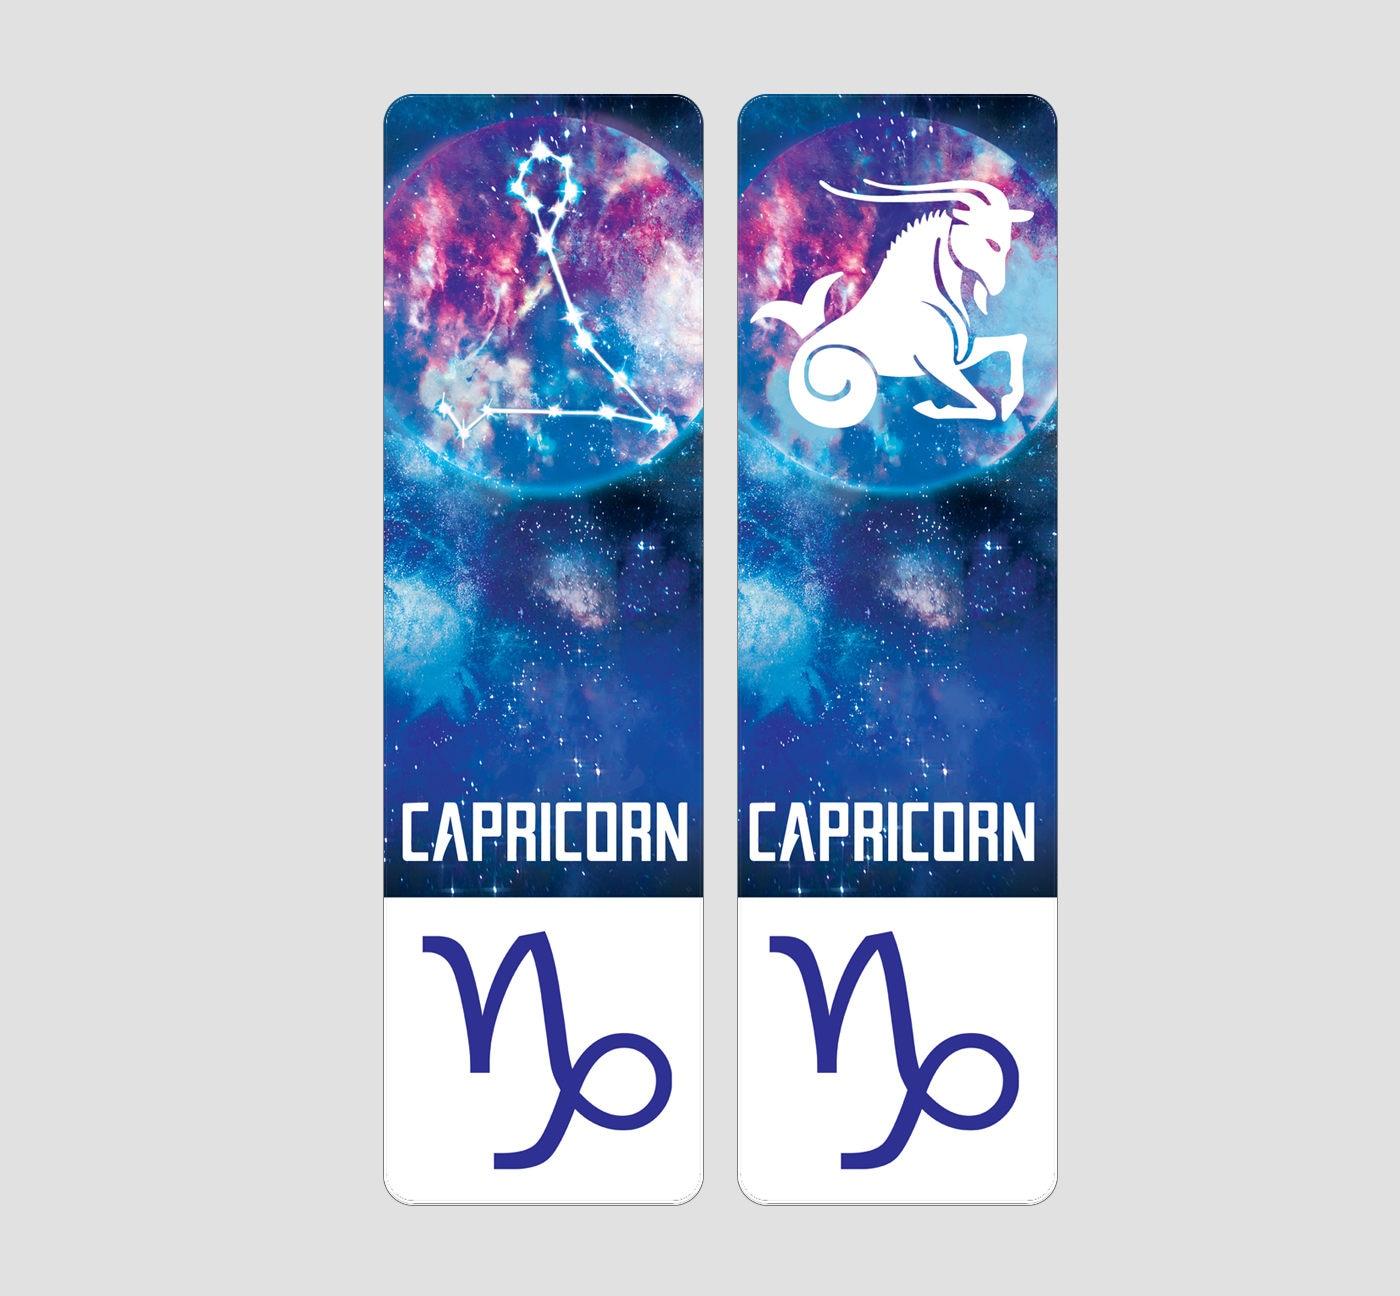 Capricorn Zodiac Sign Indestructible waterproof bookmark